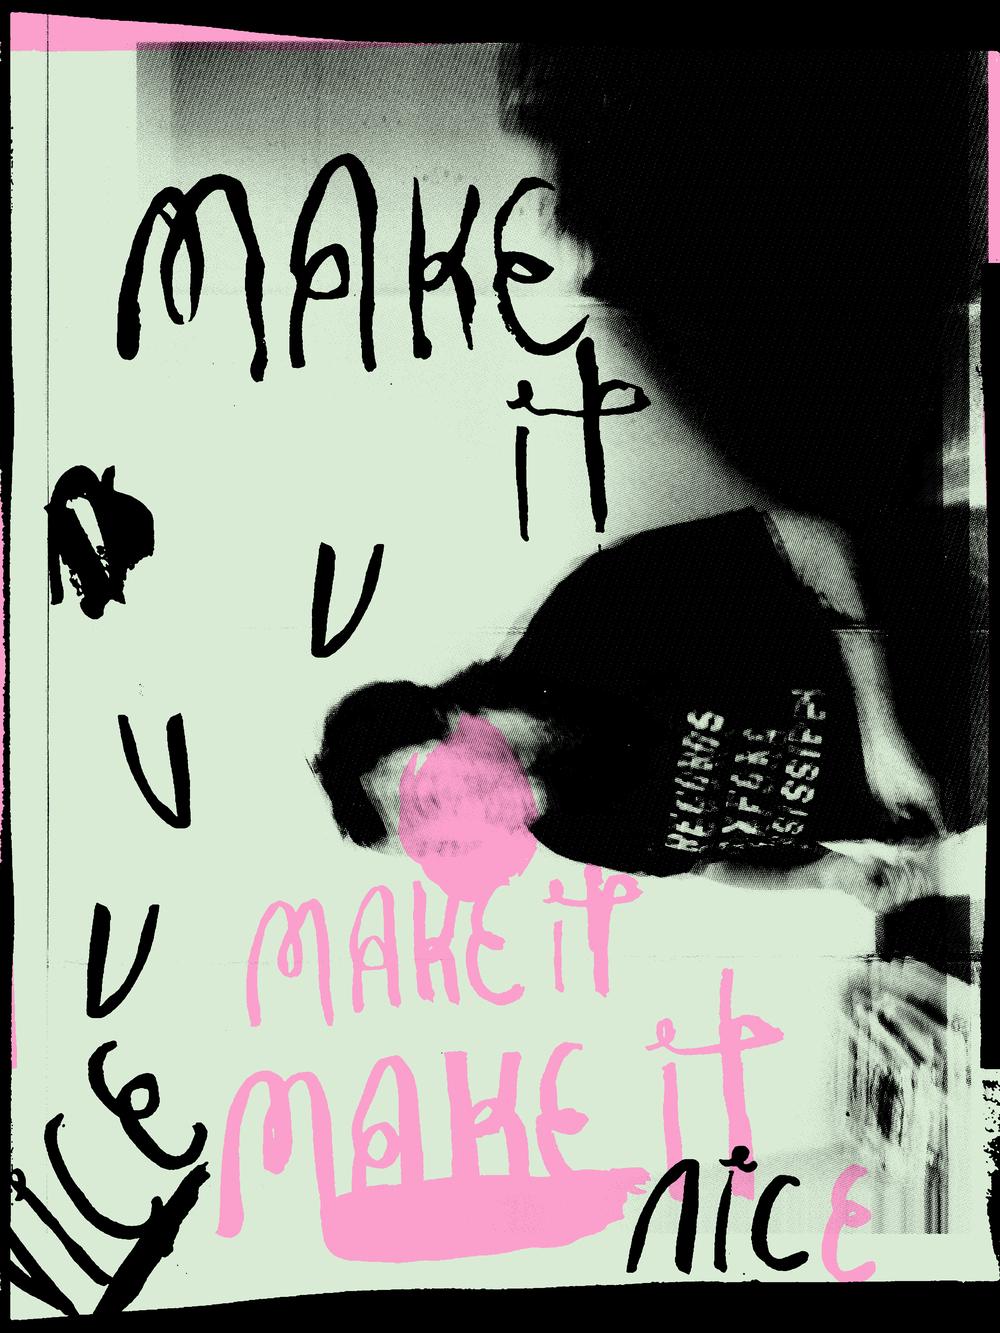 Make It VVV Nice Make It Make It Nice